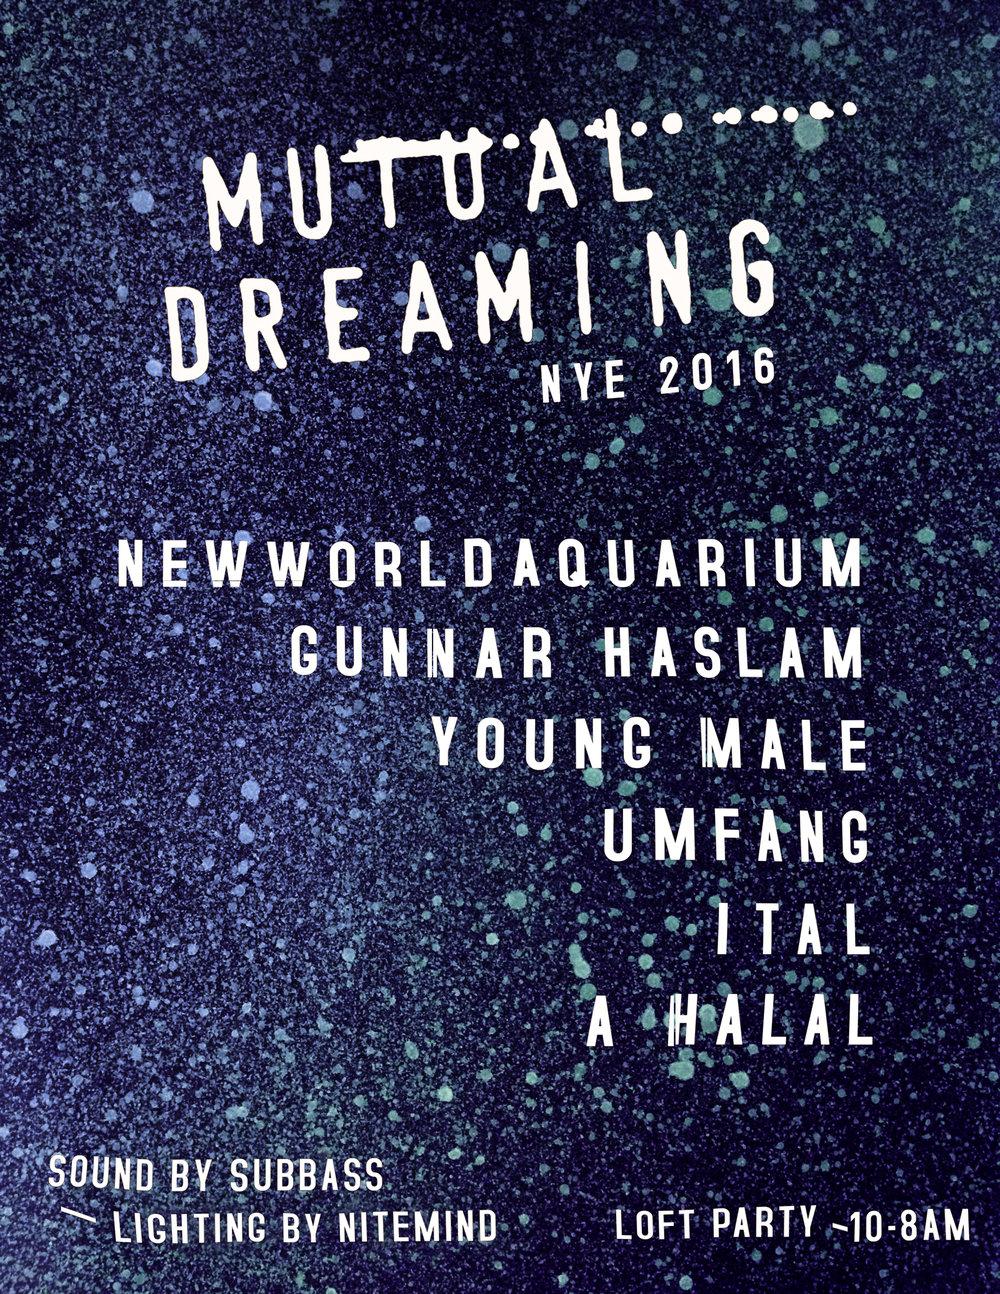 Mutual Dreaming NYE: Newworldaquarium, Gunnar Haslam, Young Male, Umfang, Ital, A. Halal  New Years 2016